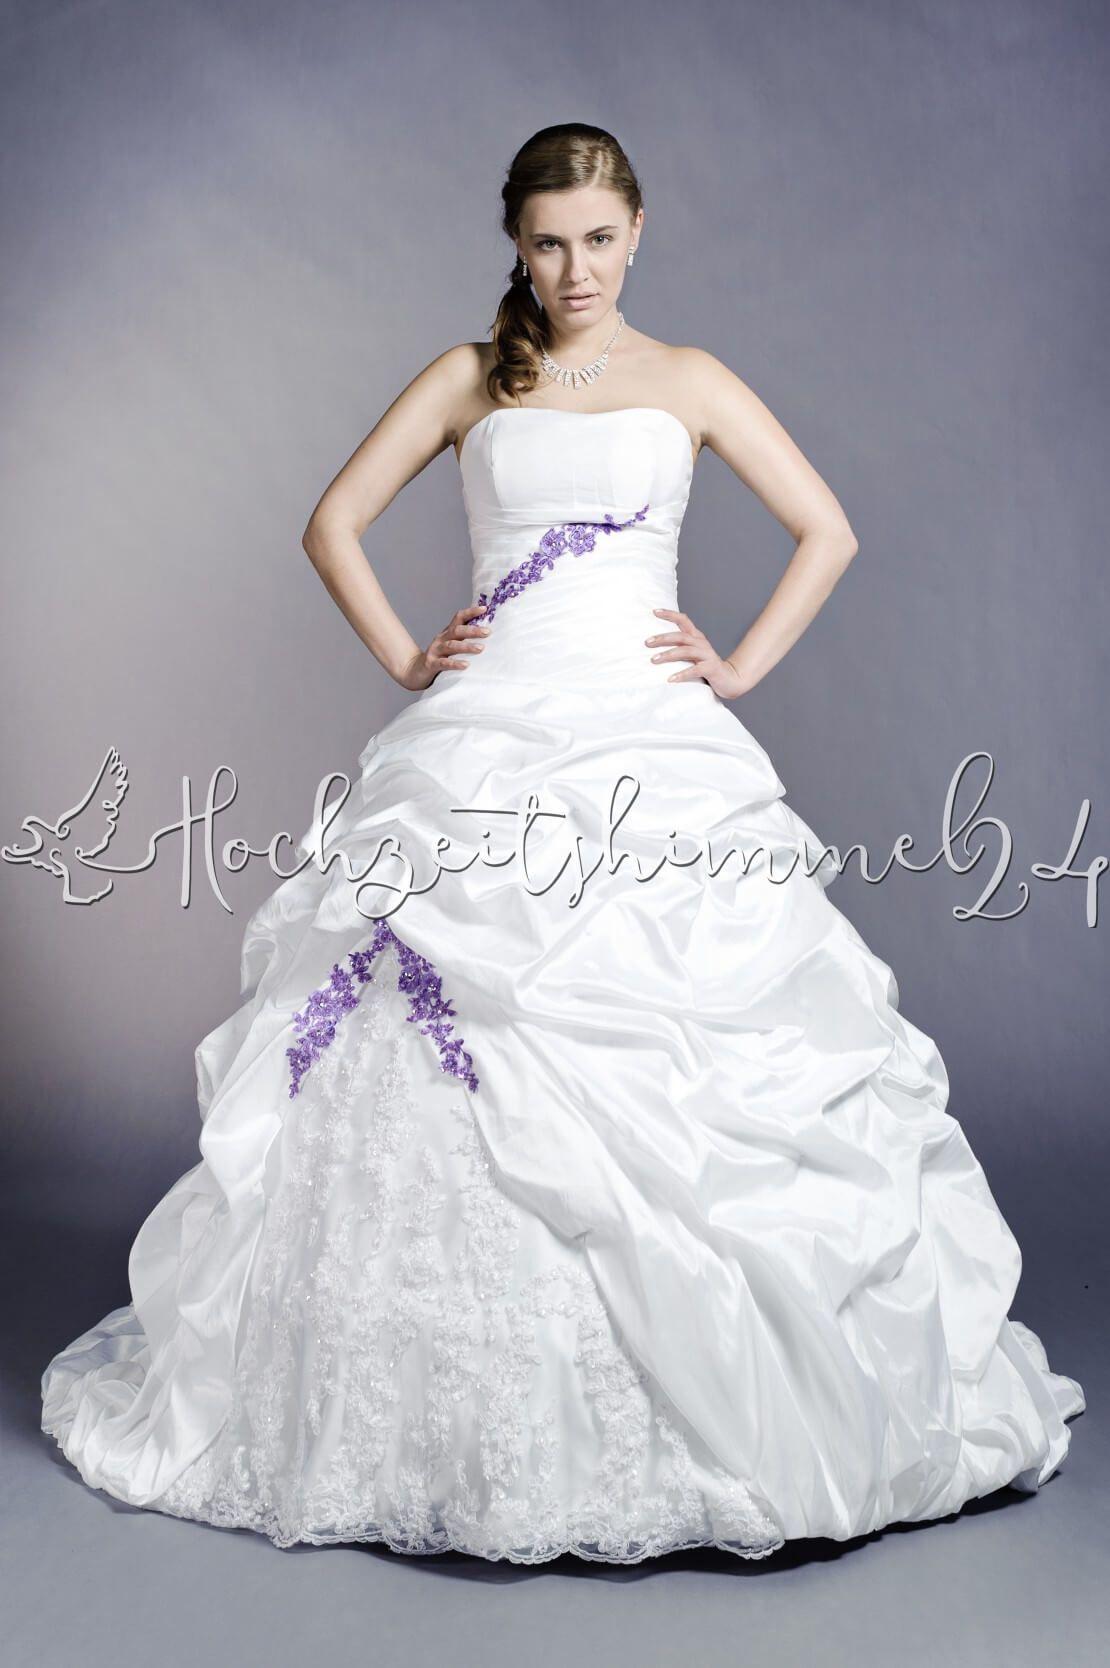 Pharbee Brautkleid A-Linie lila Taft Spitze Perlen Raffungen